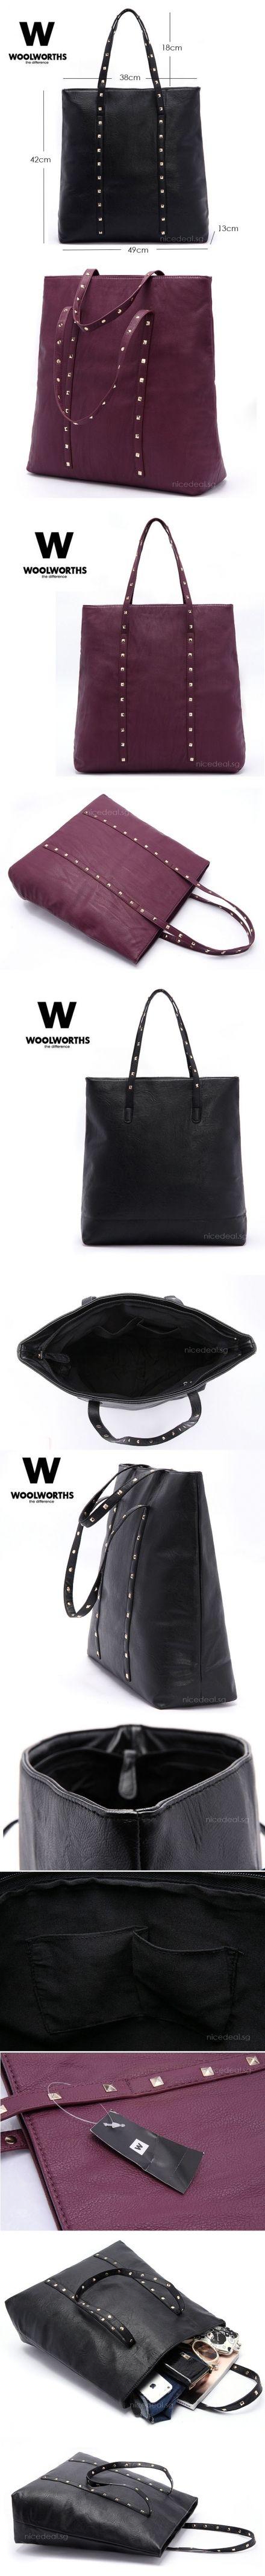 $15.90 for Austrialia Woolworths Studded Tote Shoulder Bag Handbag (BN0010 Purple); Limited Stocks Offer! | Singapore Group Buying - NiceDea...